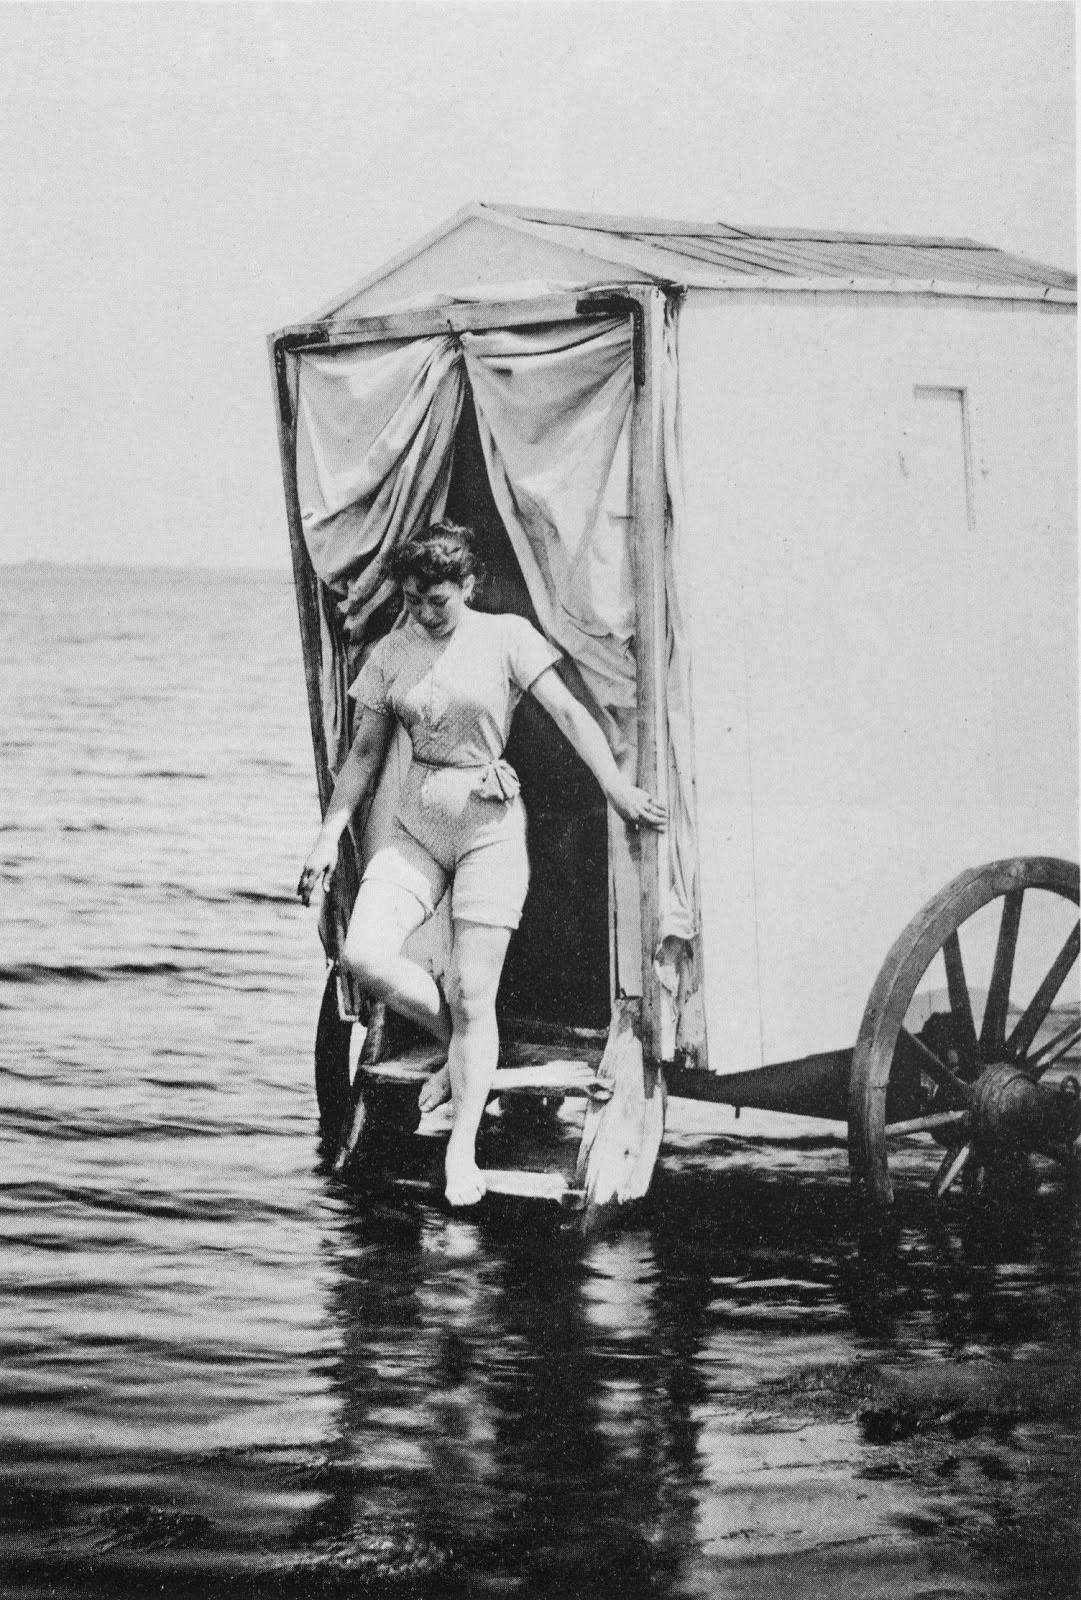 machine-bain-cabine-plage-mer-19.jpg